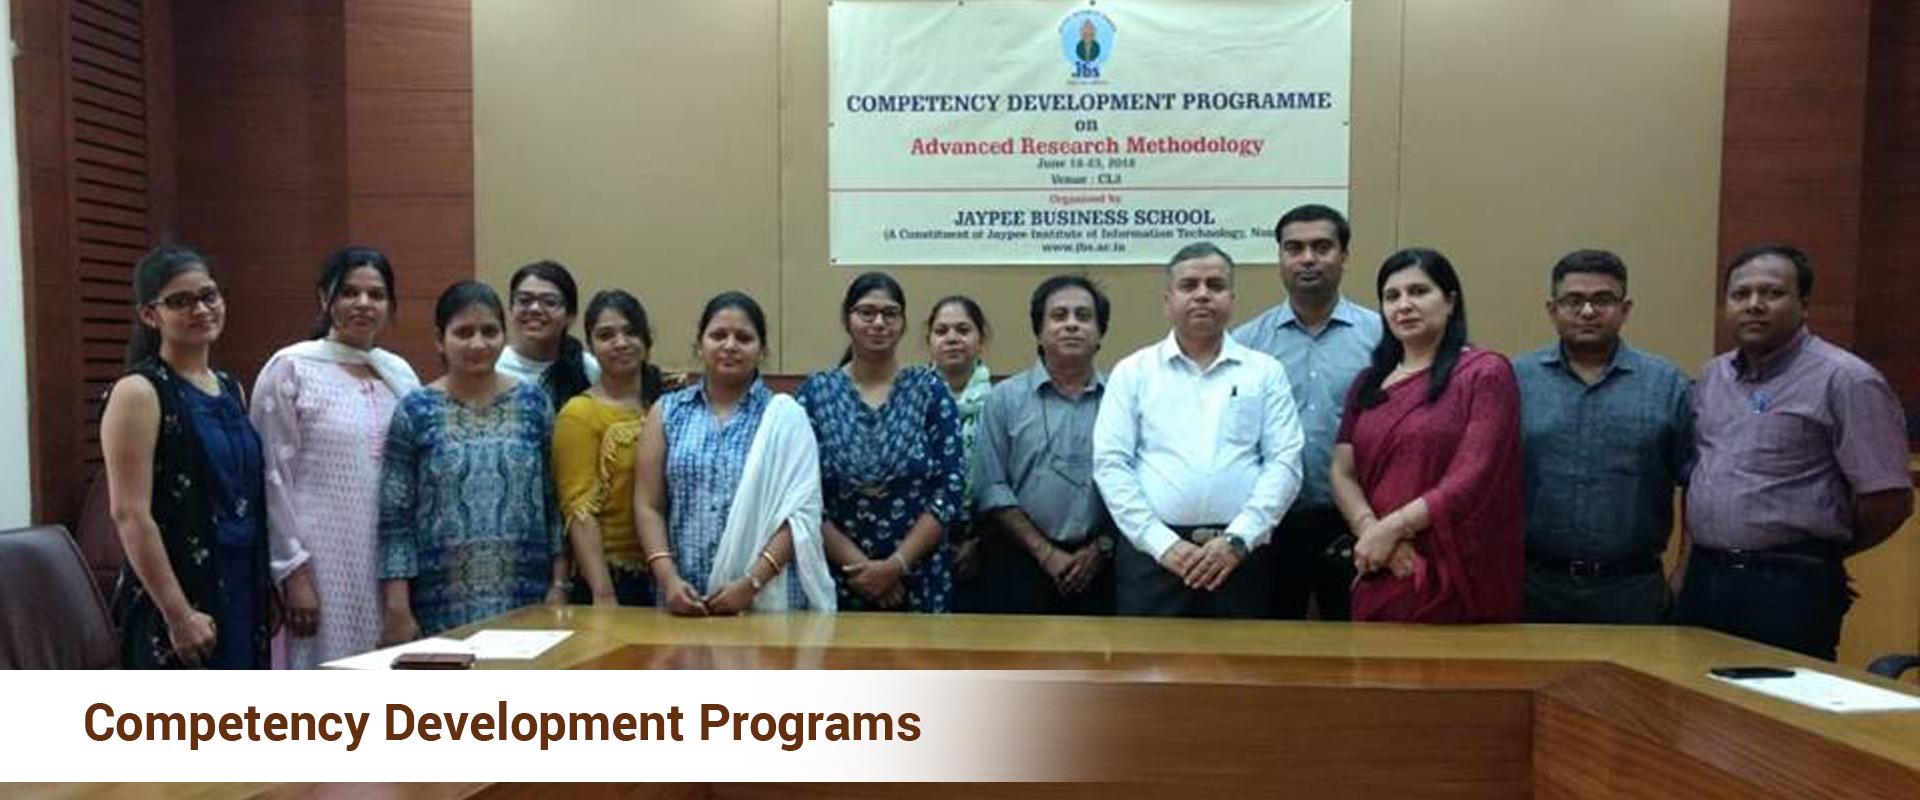 Competency Development Programs